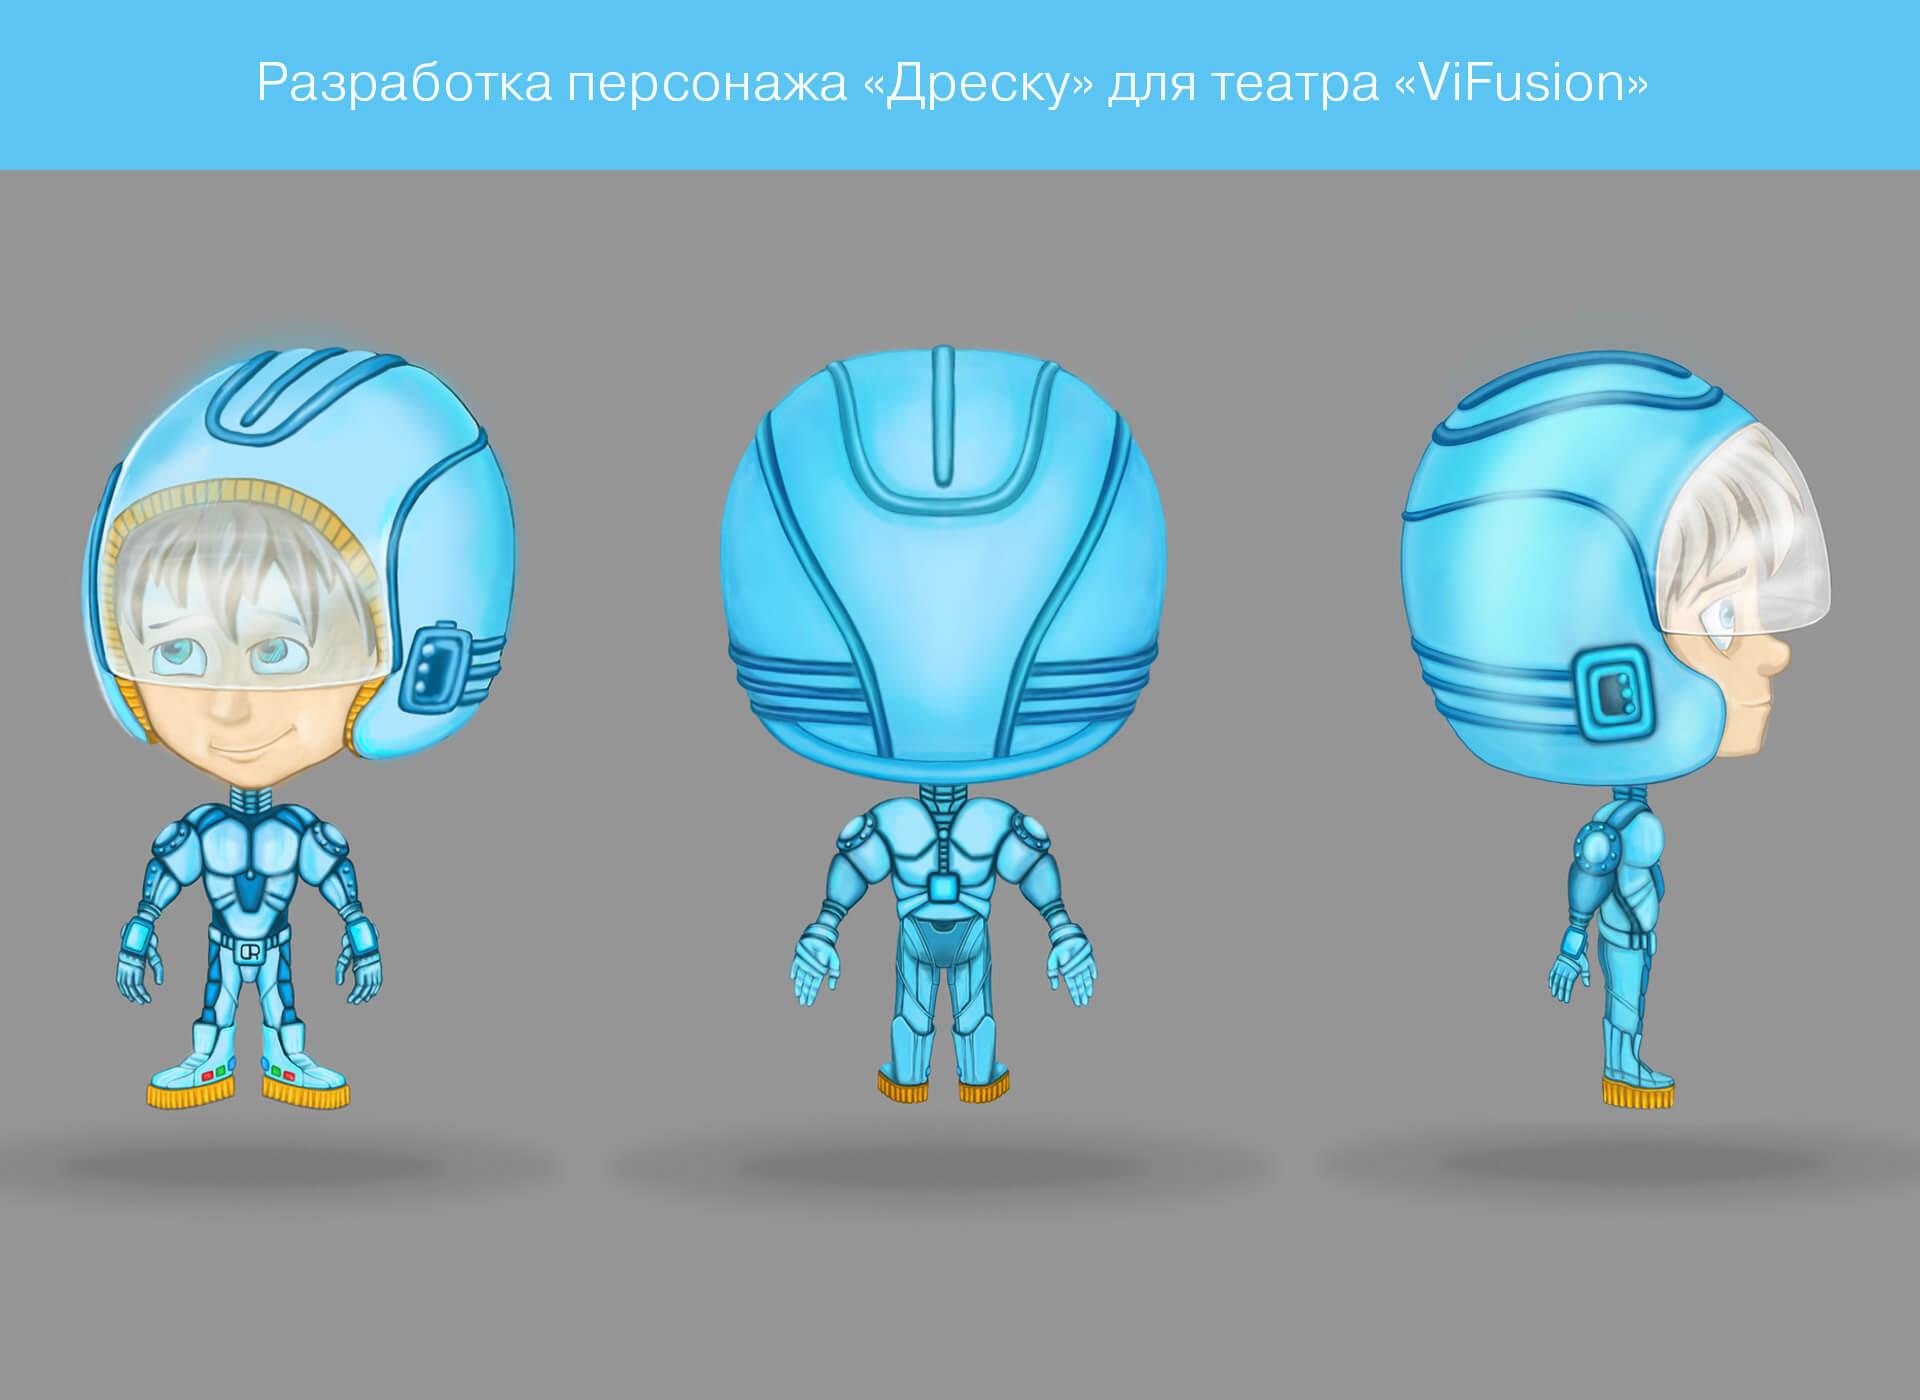 prokochuk_irina_dresku-character-for-fusion-theatre_1